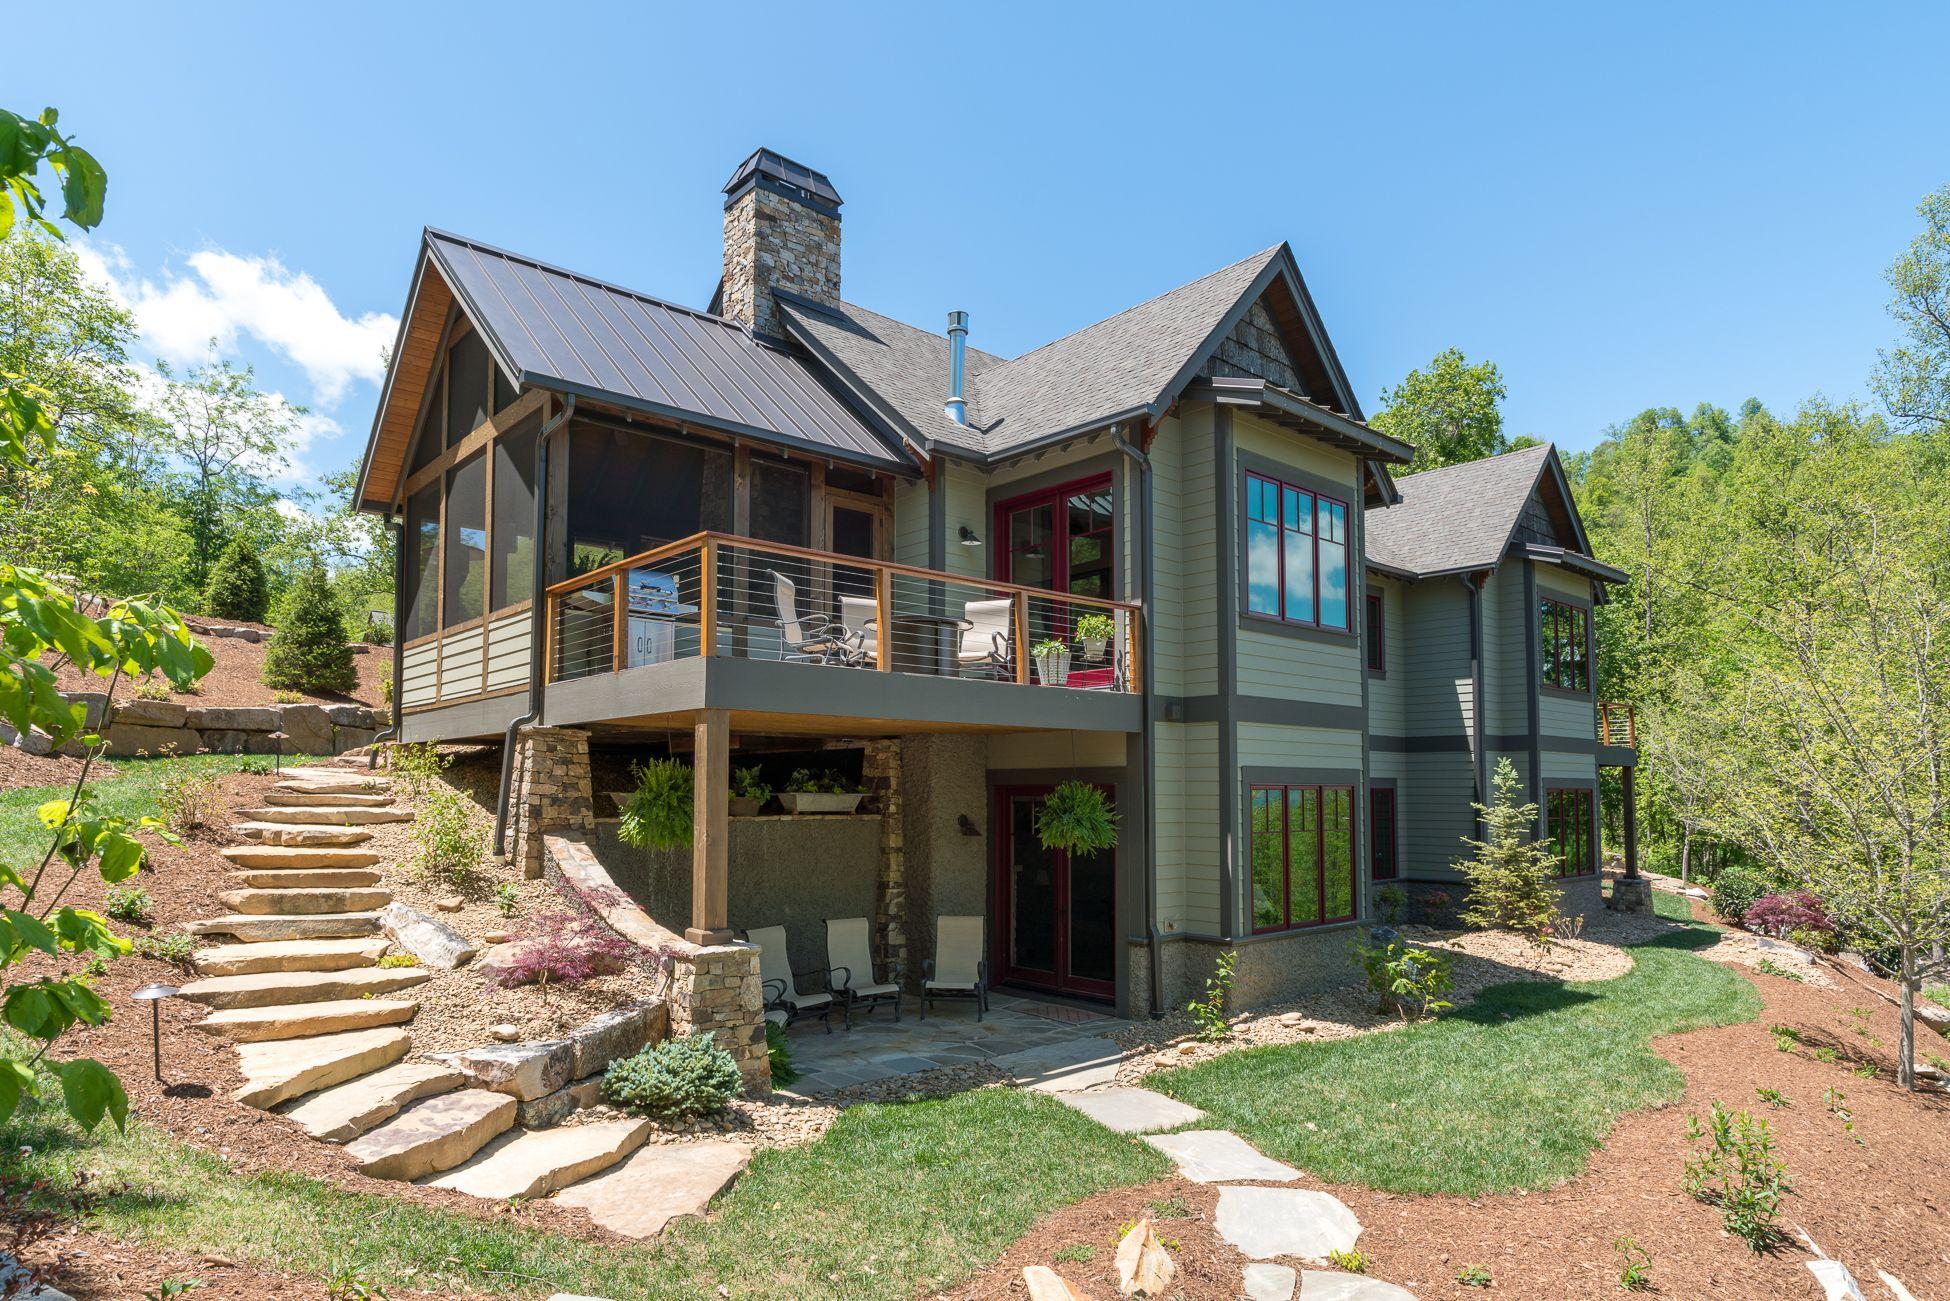 Craftsman Home Designed For The Mountains Of Western North Carolina.  Designed By ACM Design,